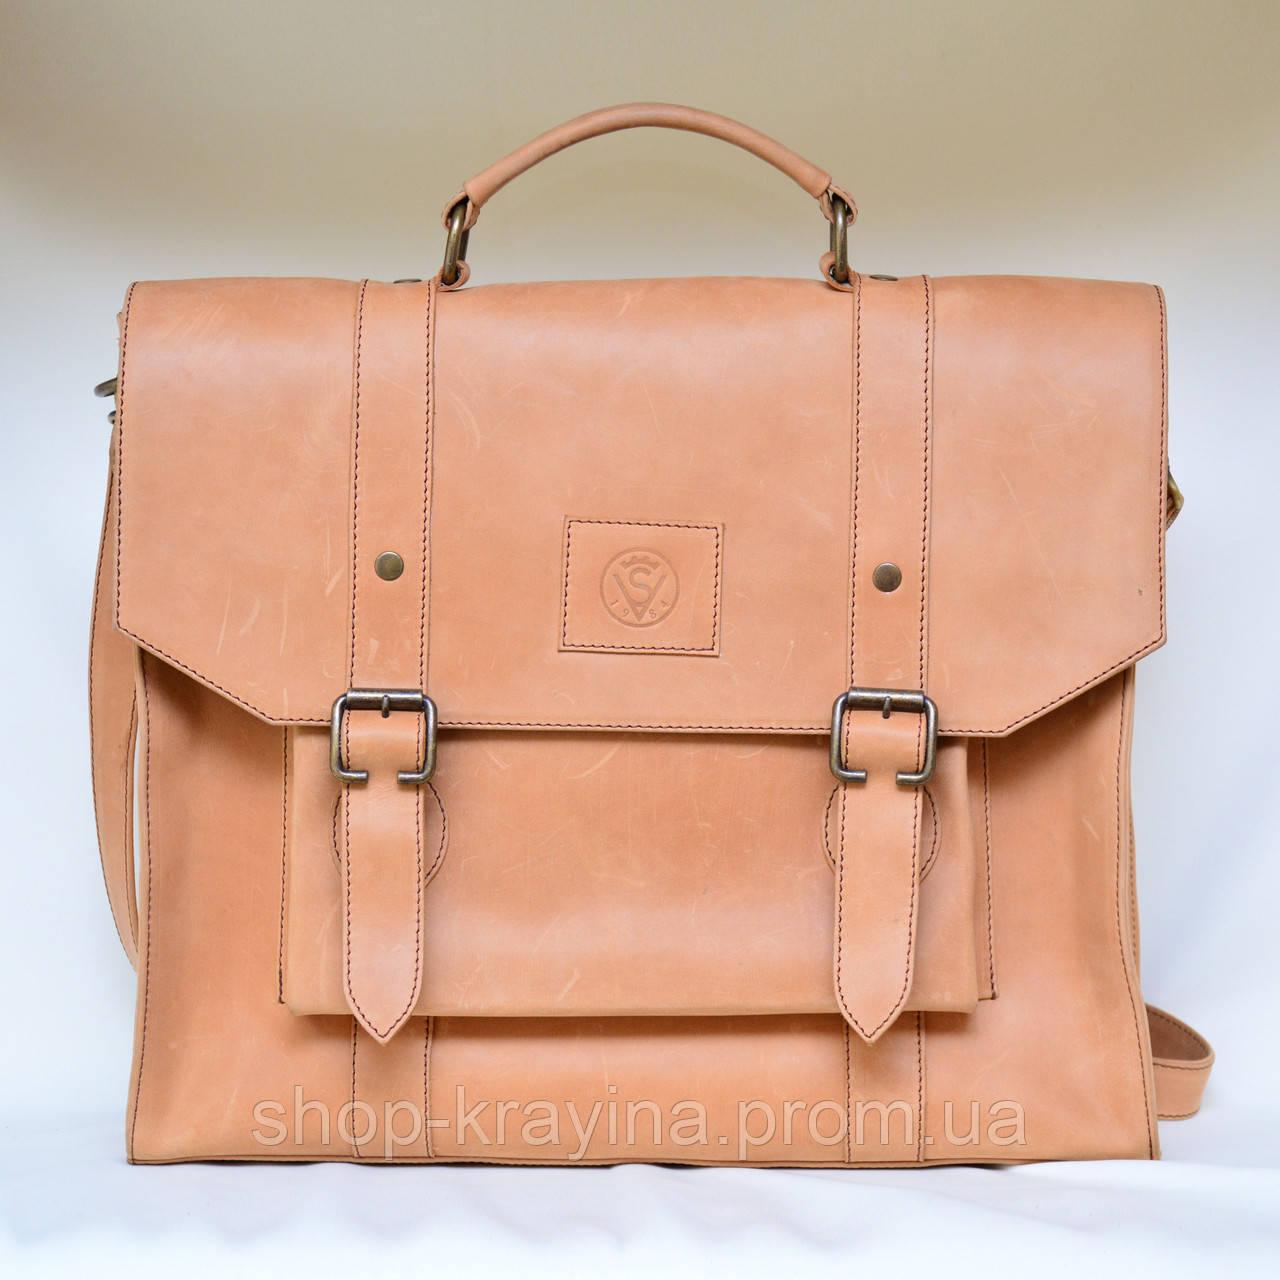 Портфель кожаный VS114 light beige 38х35х10 см